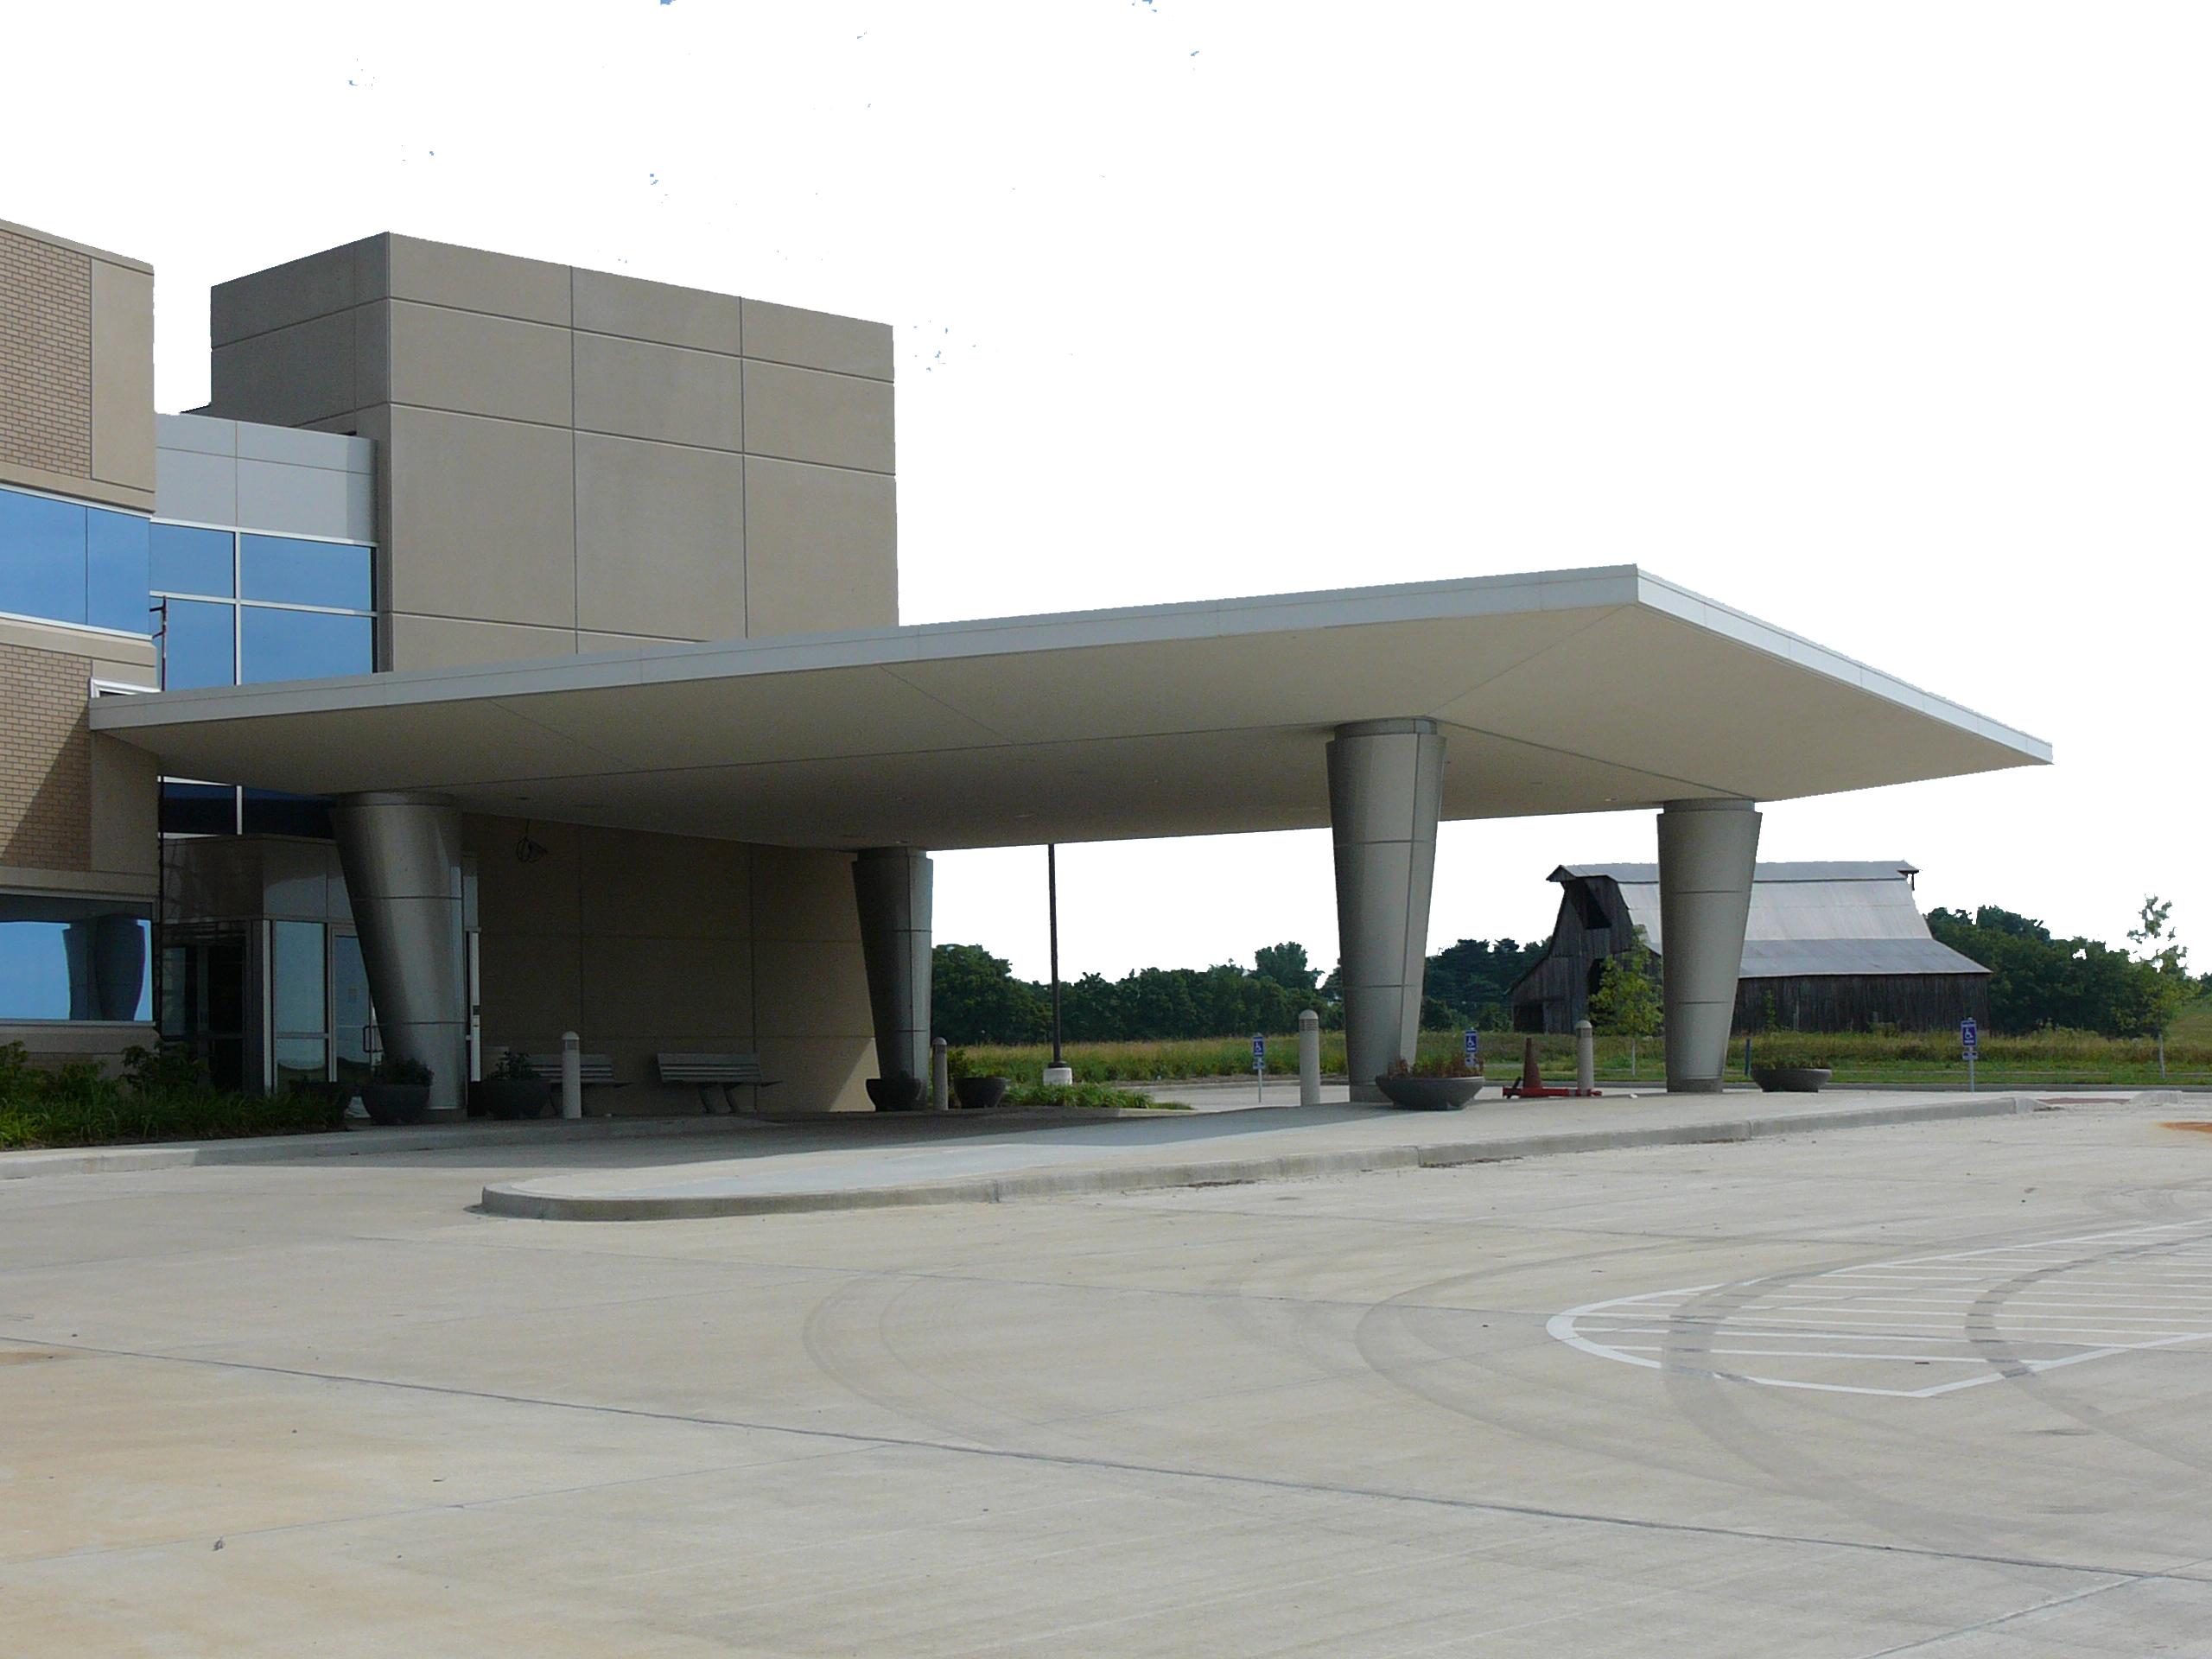 Southeast Missouri Hospital, West Campus (Cape Girardeau)